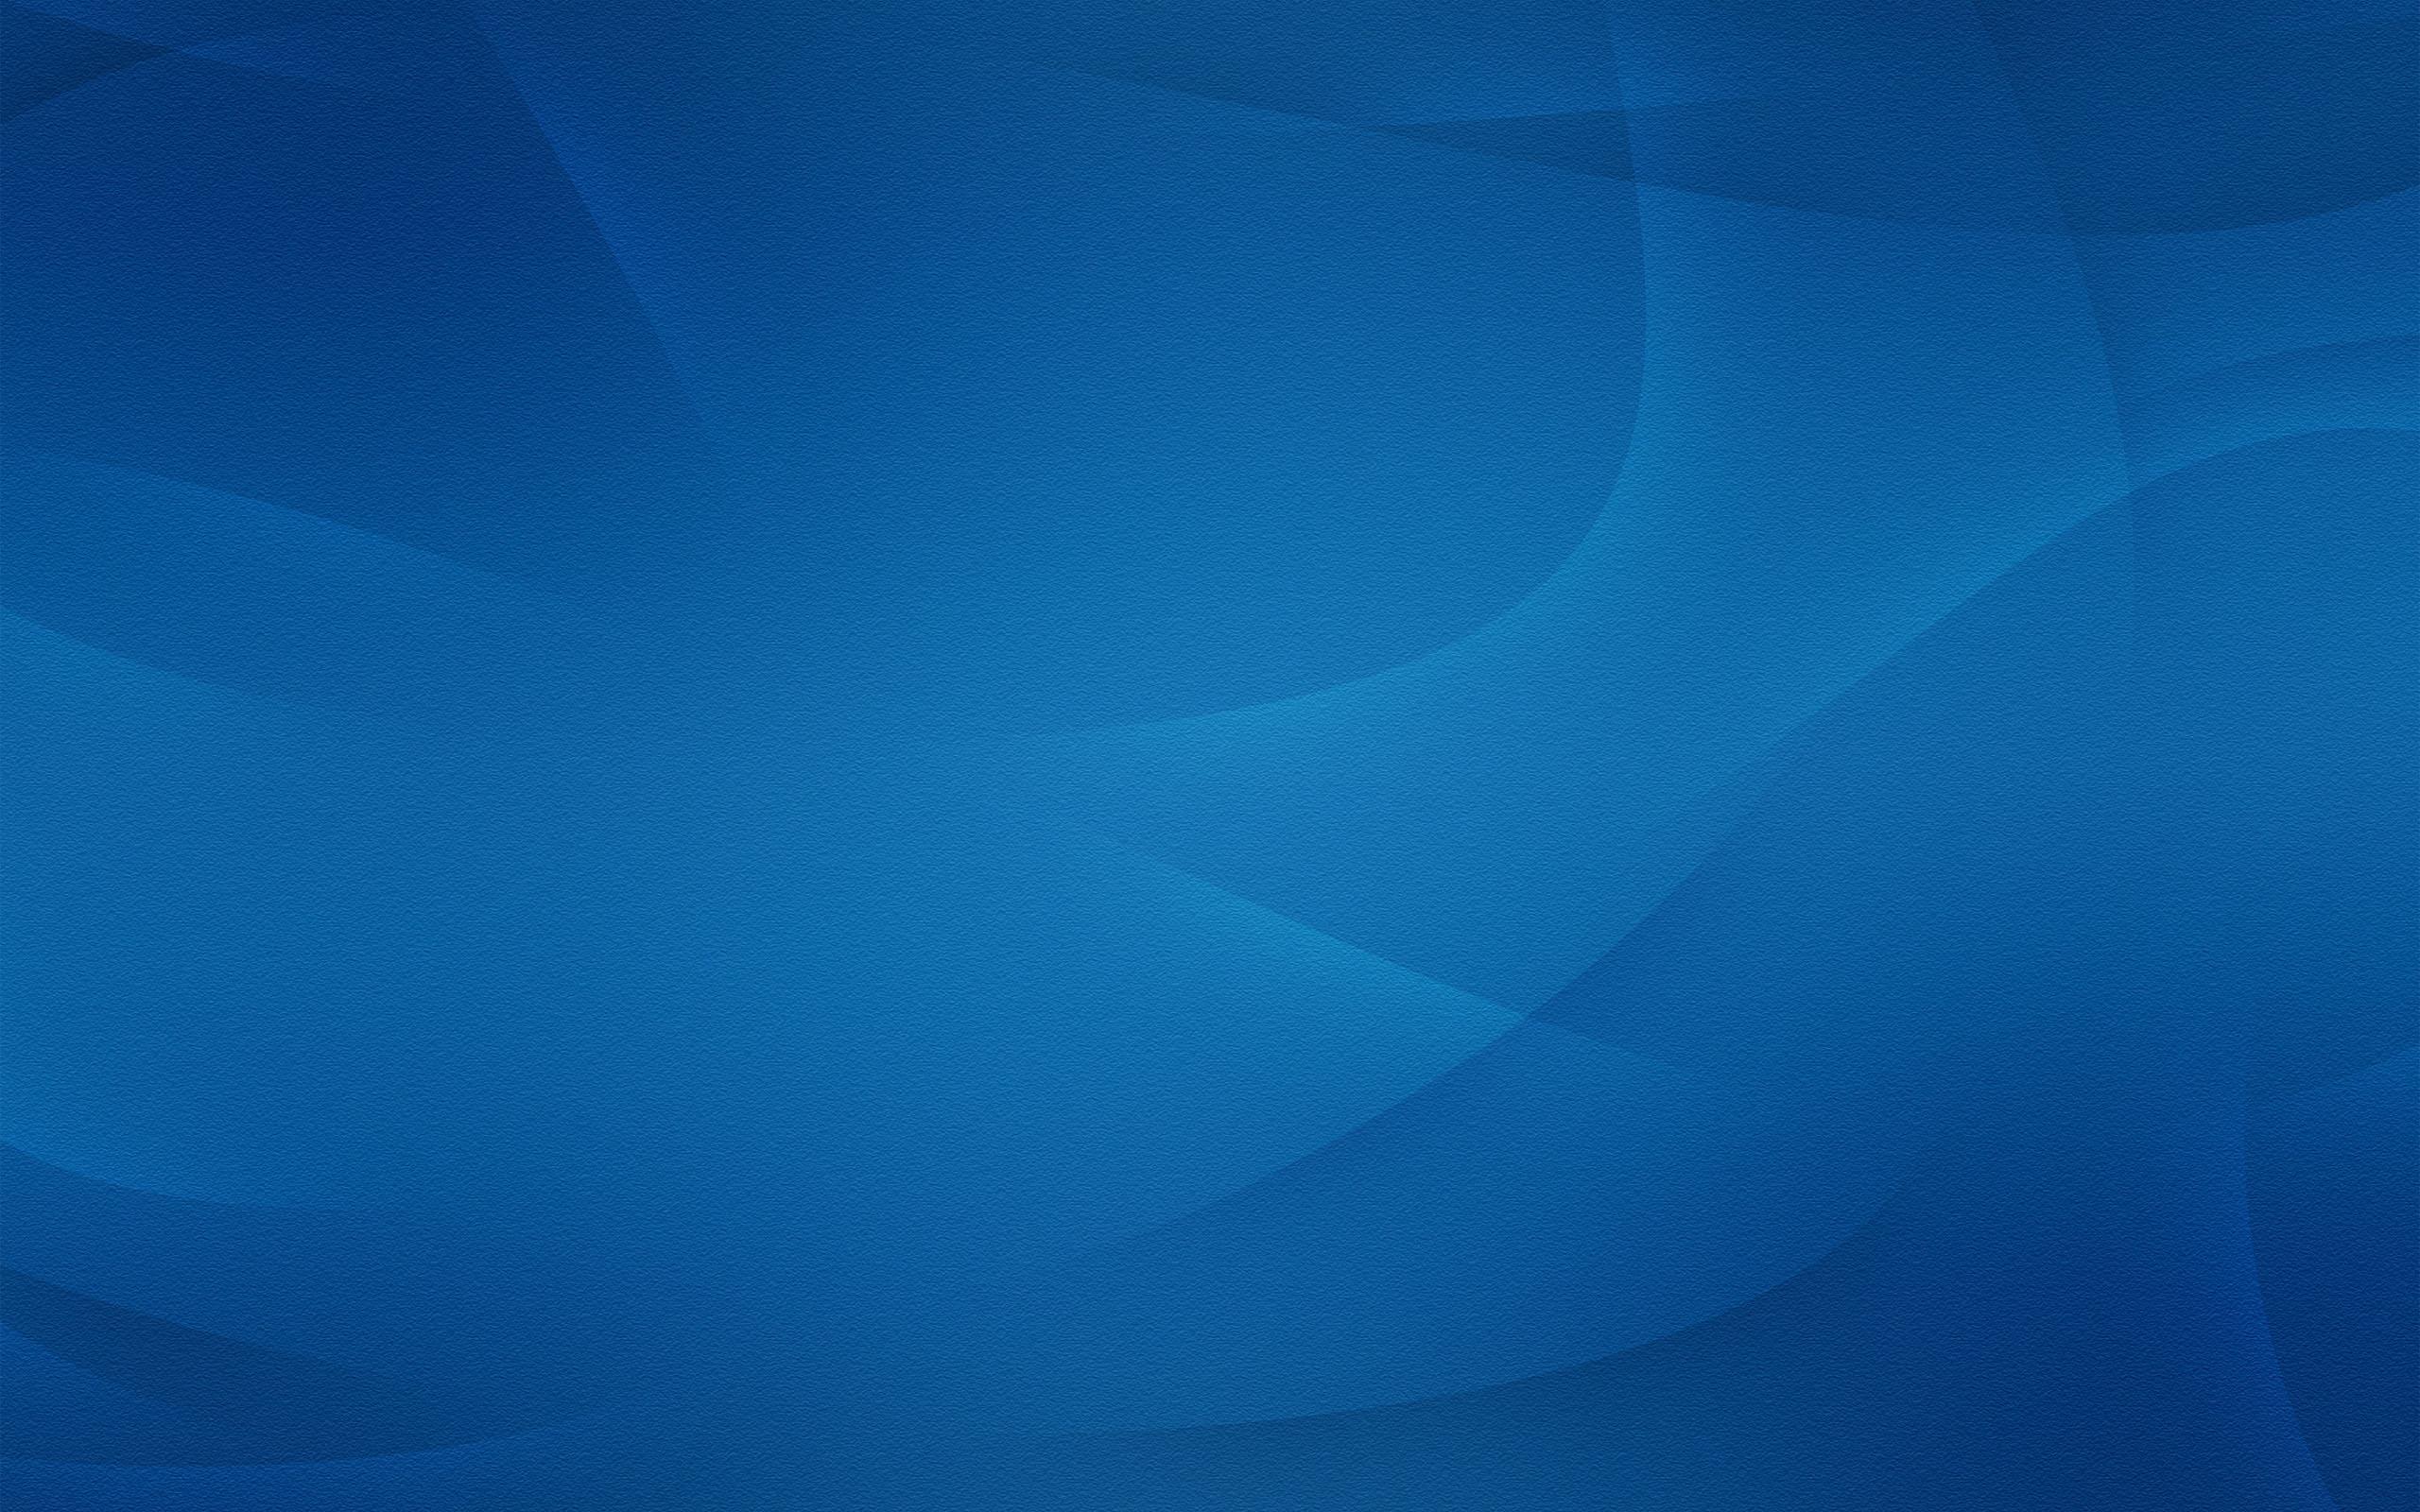 73 Blue Desktop Wallpaper On Wallpapersafari